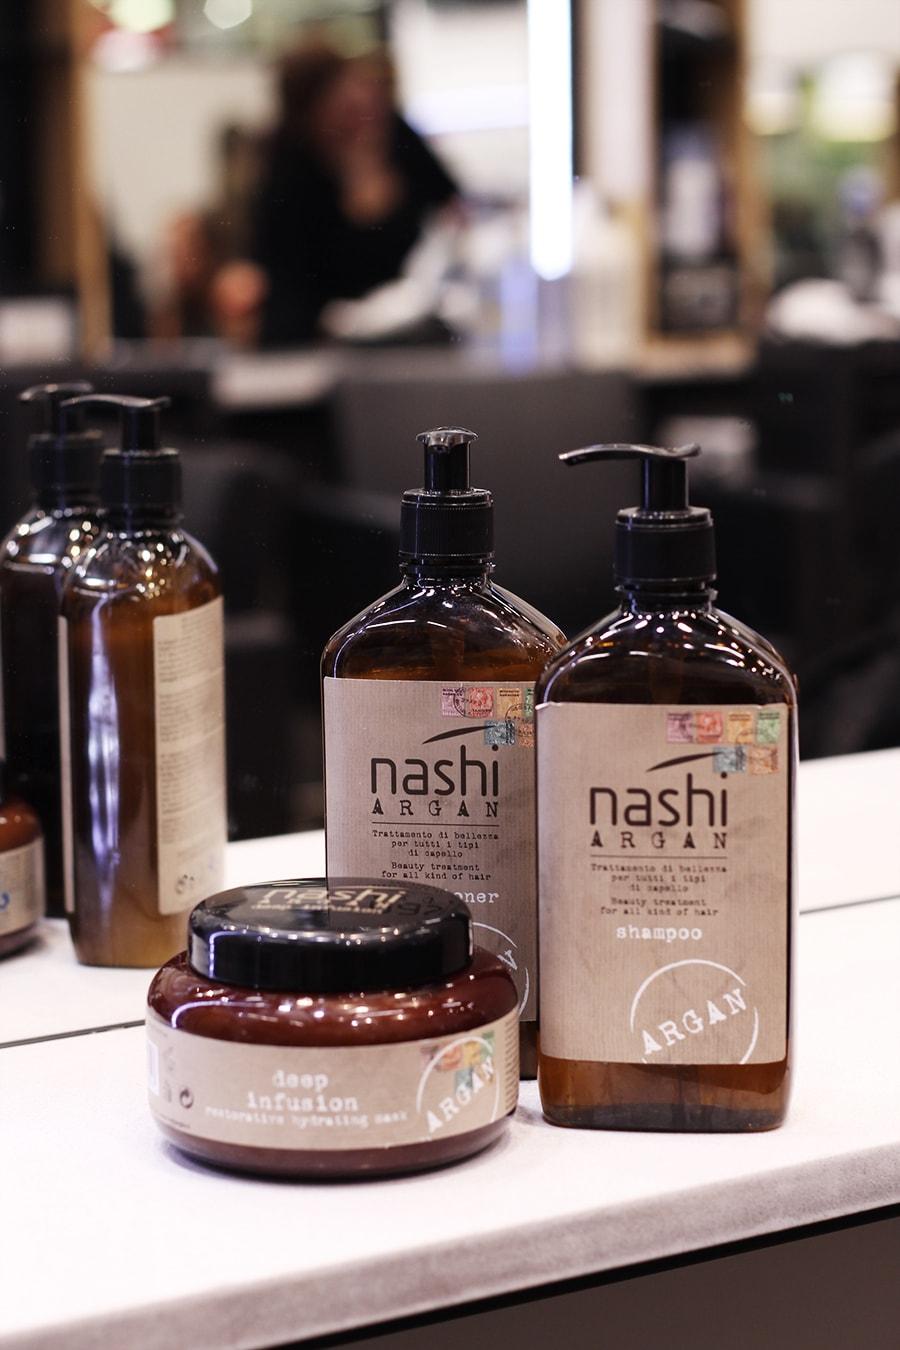 Experiencia Nashi Palumbo Chile - Tratamiento capilar